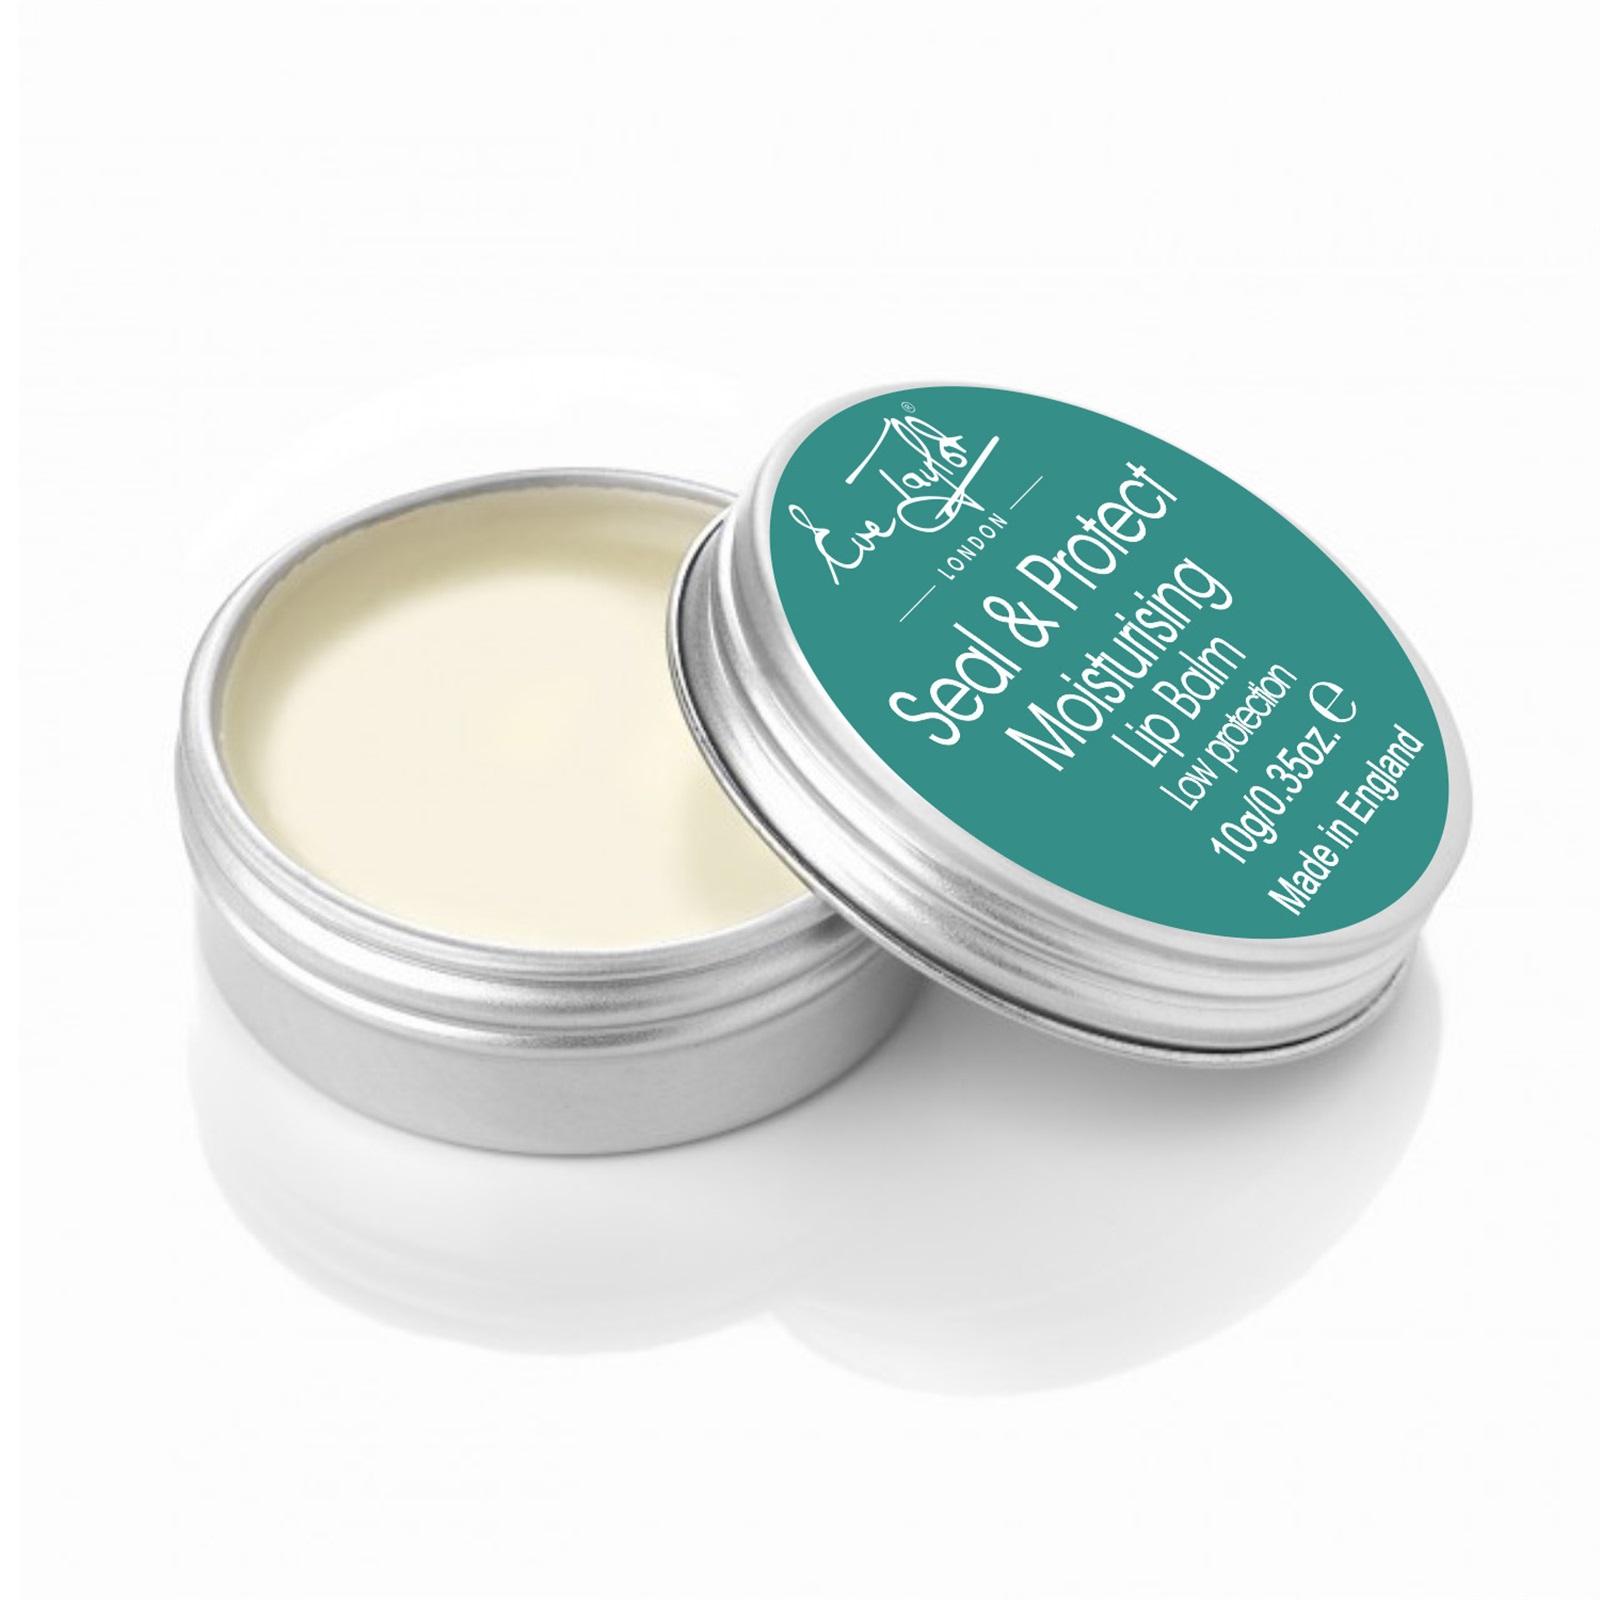 seal_and_protect_lip_balm_new_tin